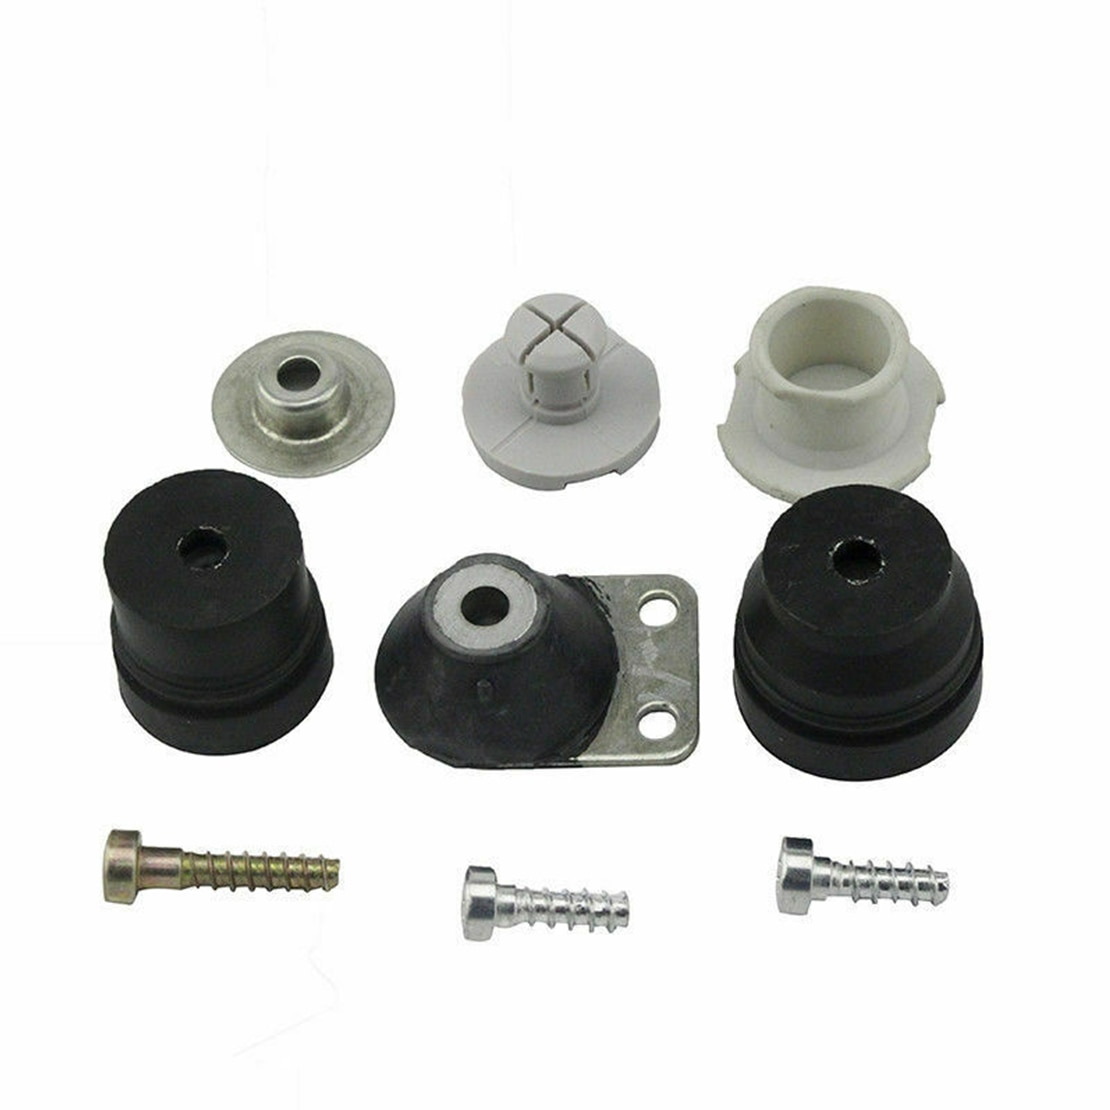 1121 790 9912 anti-vibração buffer conjunto parafuso plug tampa kit de montagem 1121 790 9909 apto para stihl 026 024 ms240 ms260 motosserra